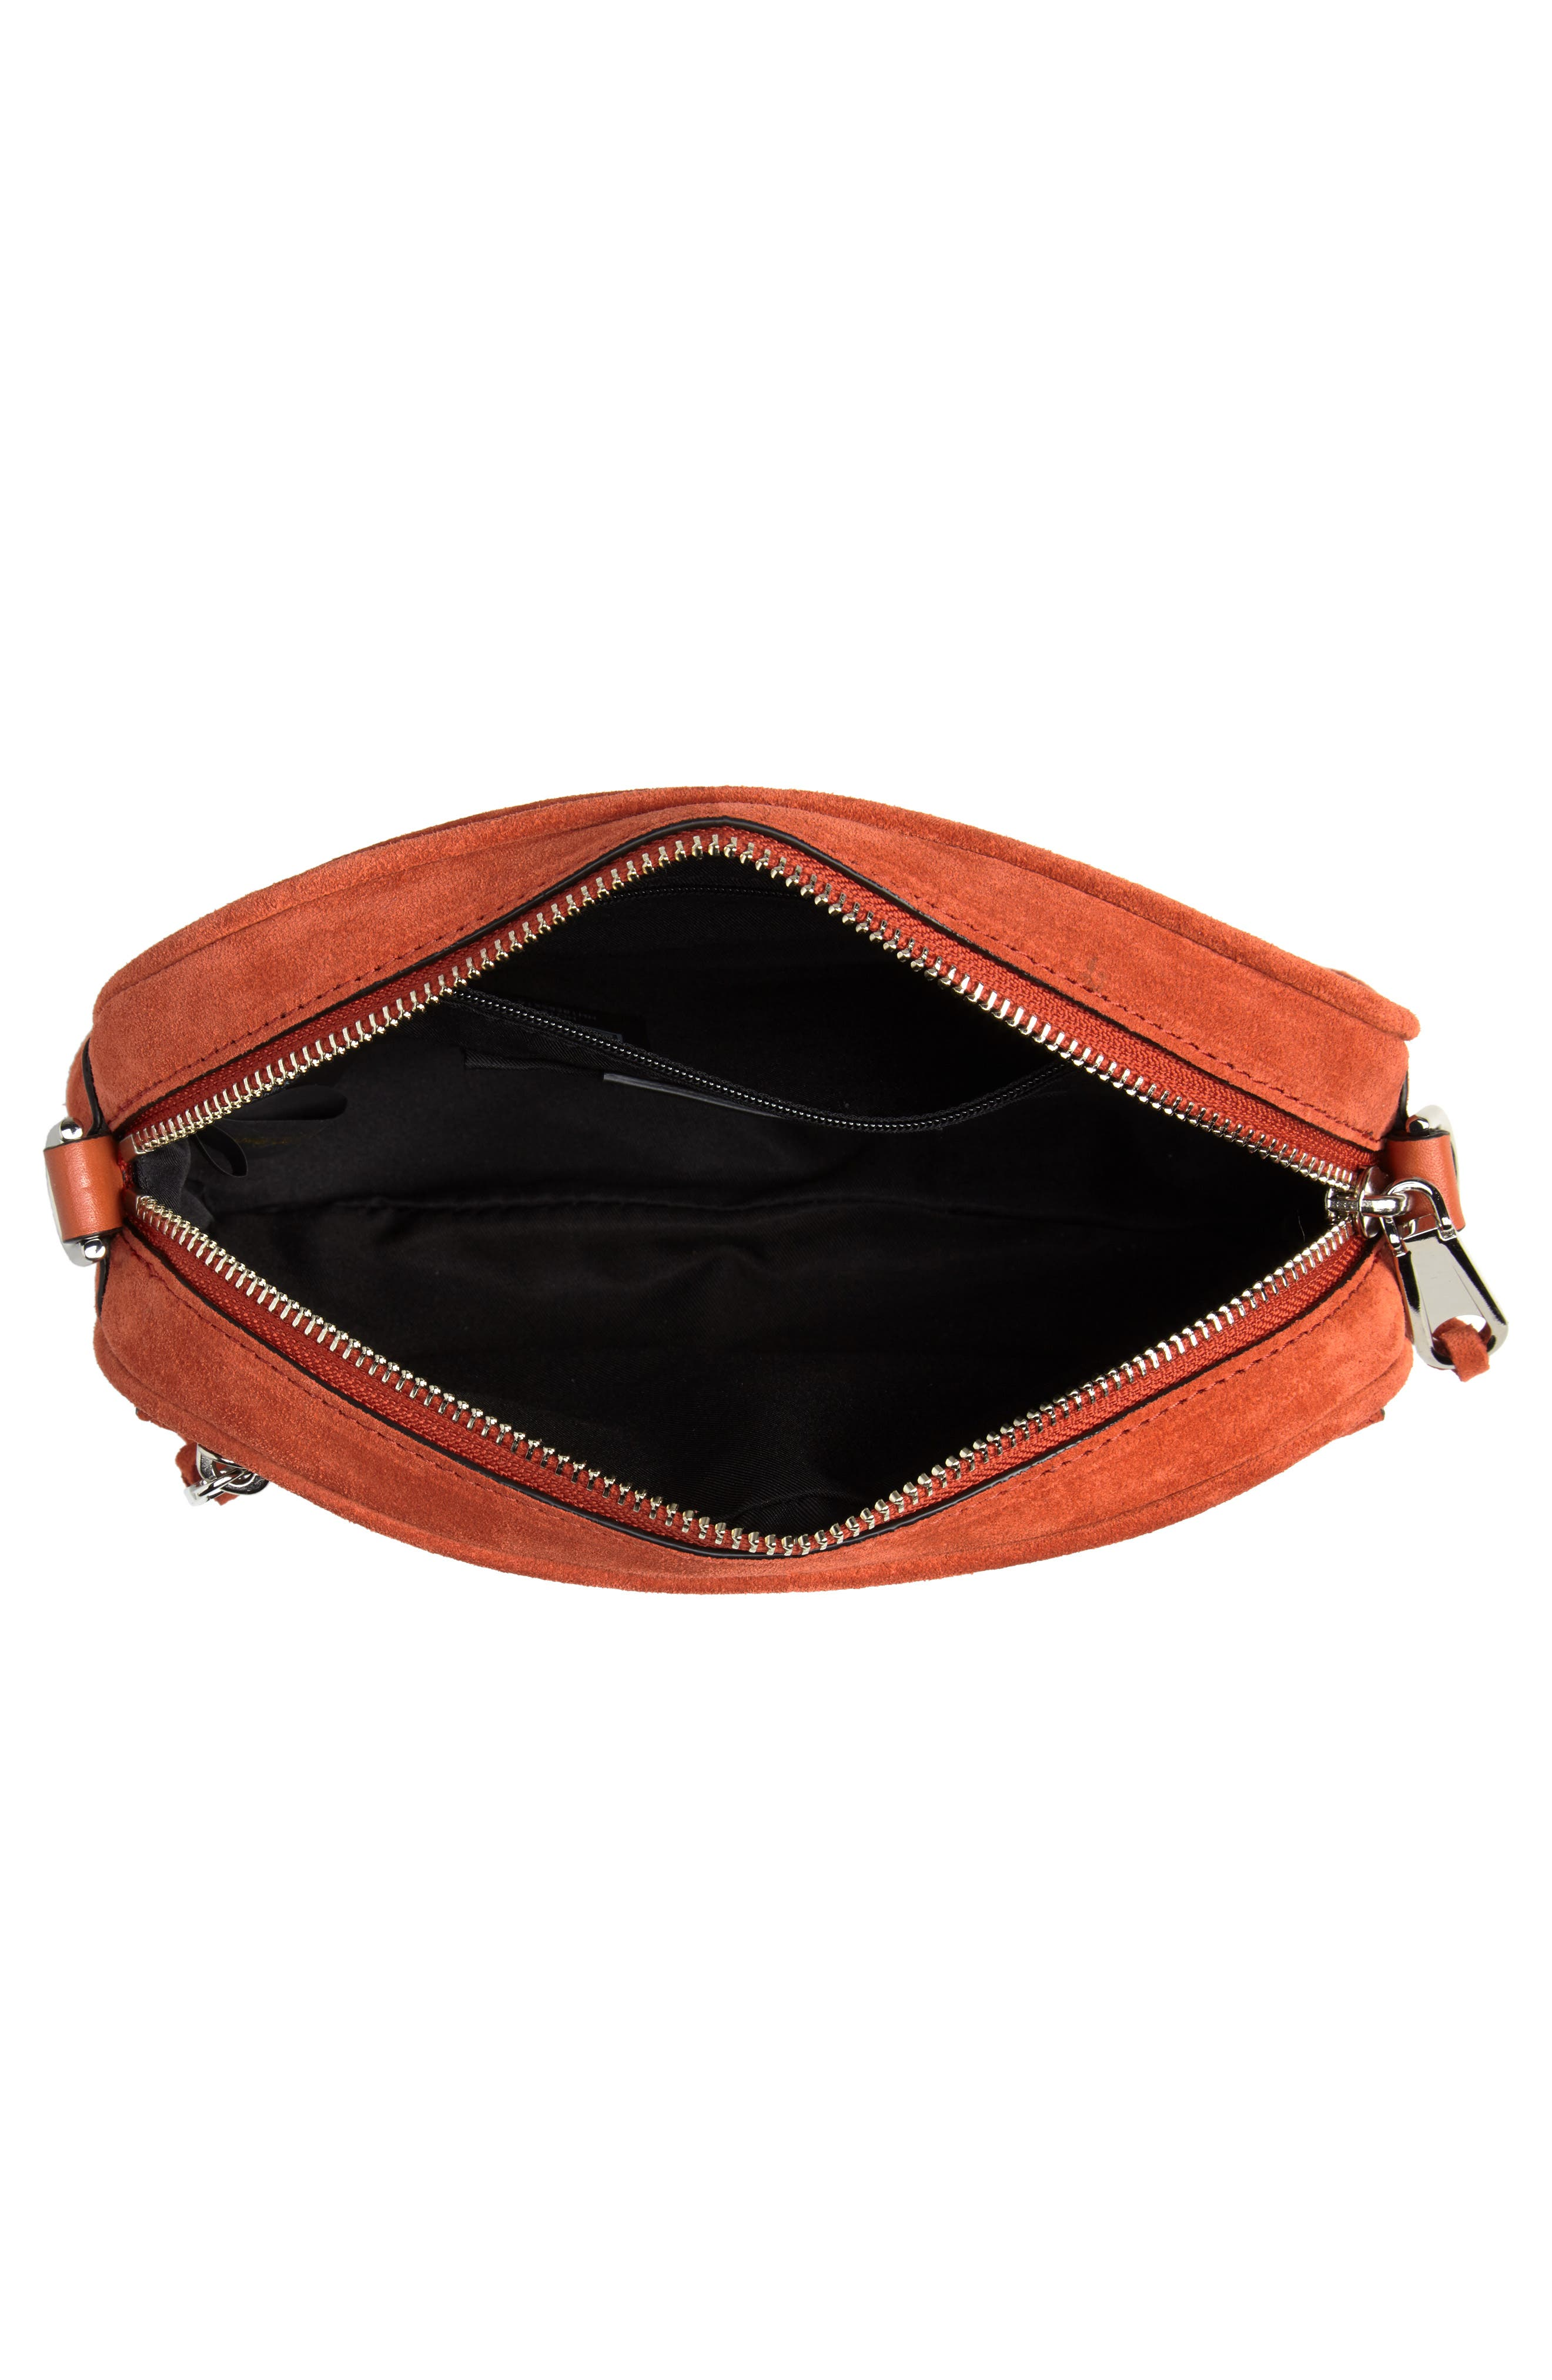 REBECCA MINKOFF,                             Blythe Suede Crossbody Bag,                             Alternate thumbnail 4, color,                             RUST